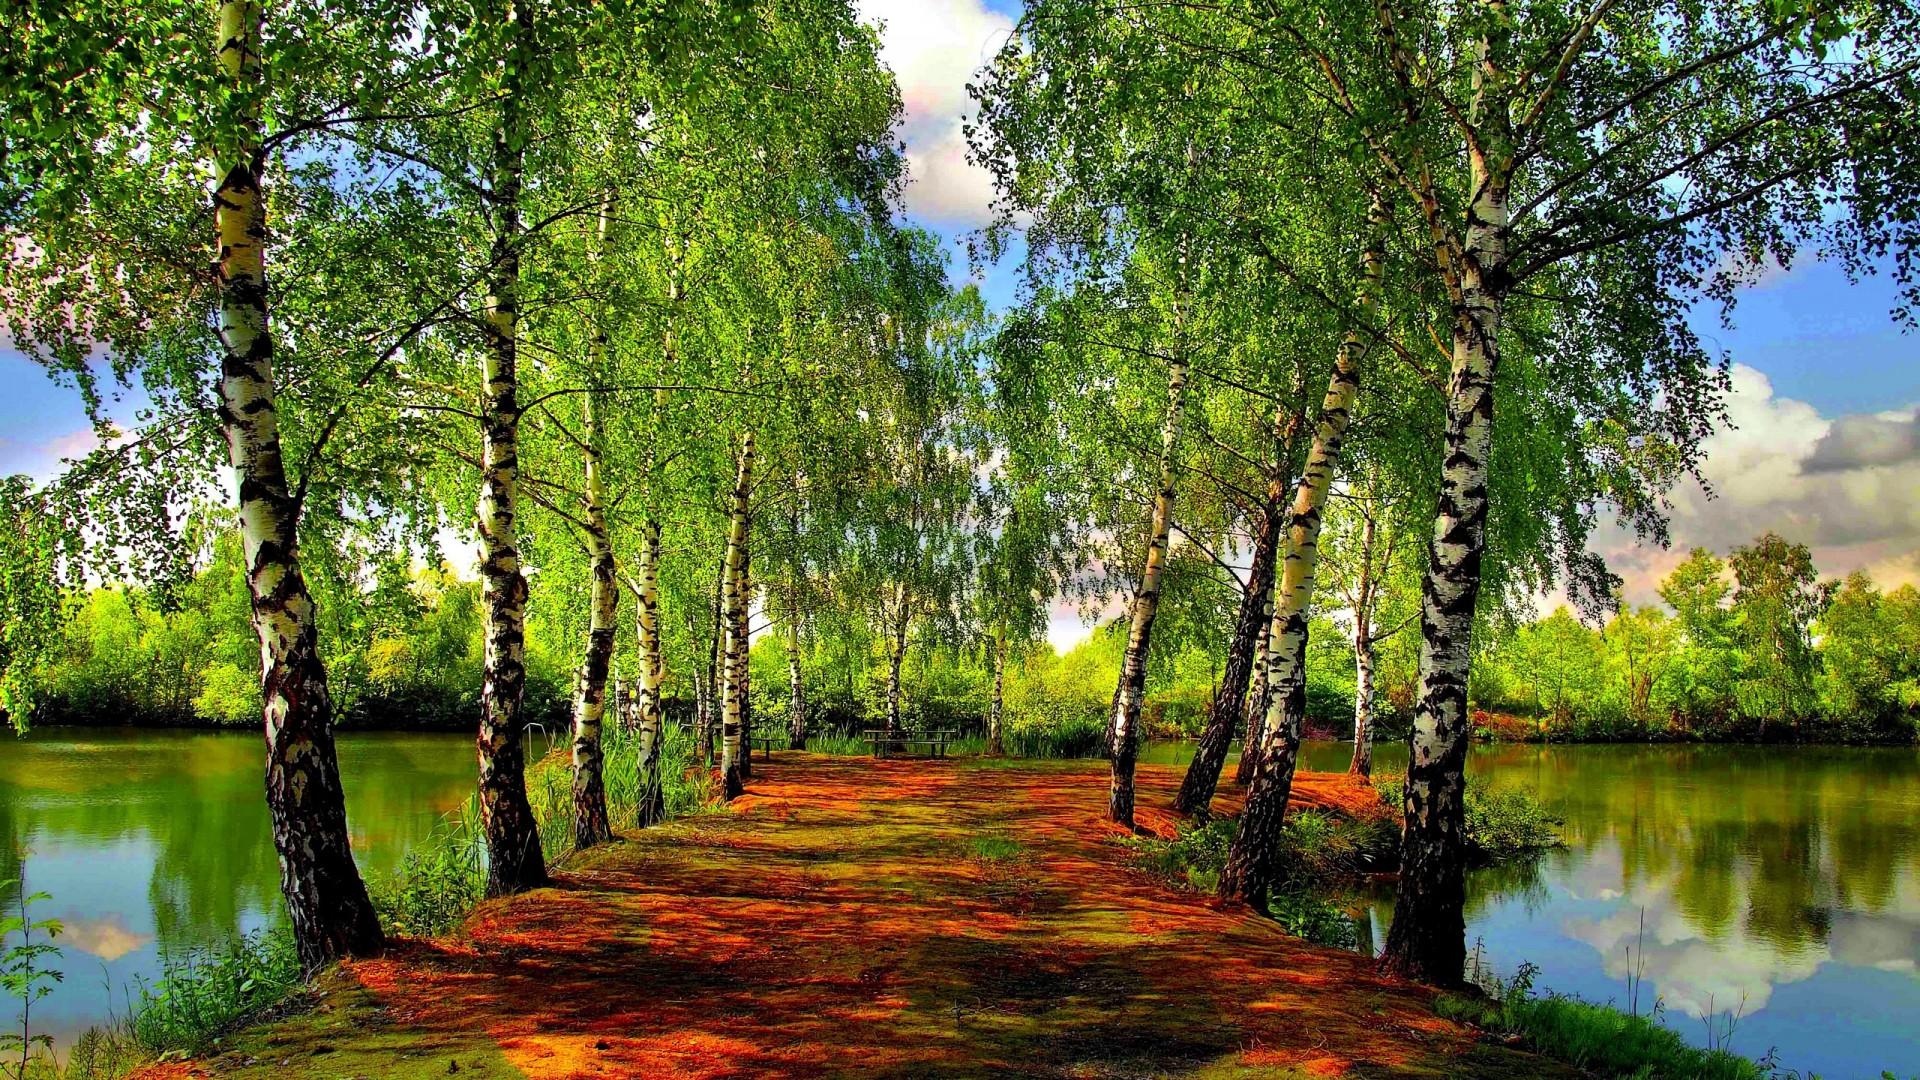 речка лето зелень березы онлайн